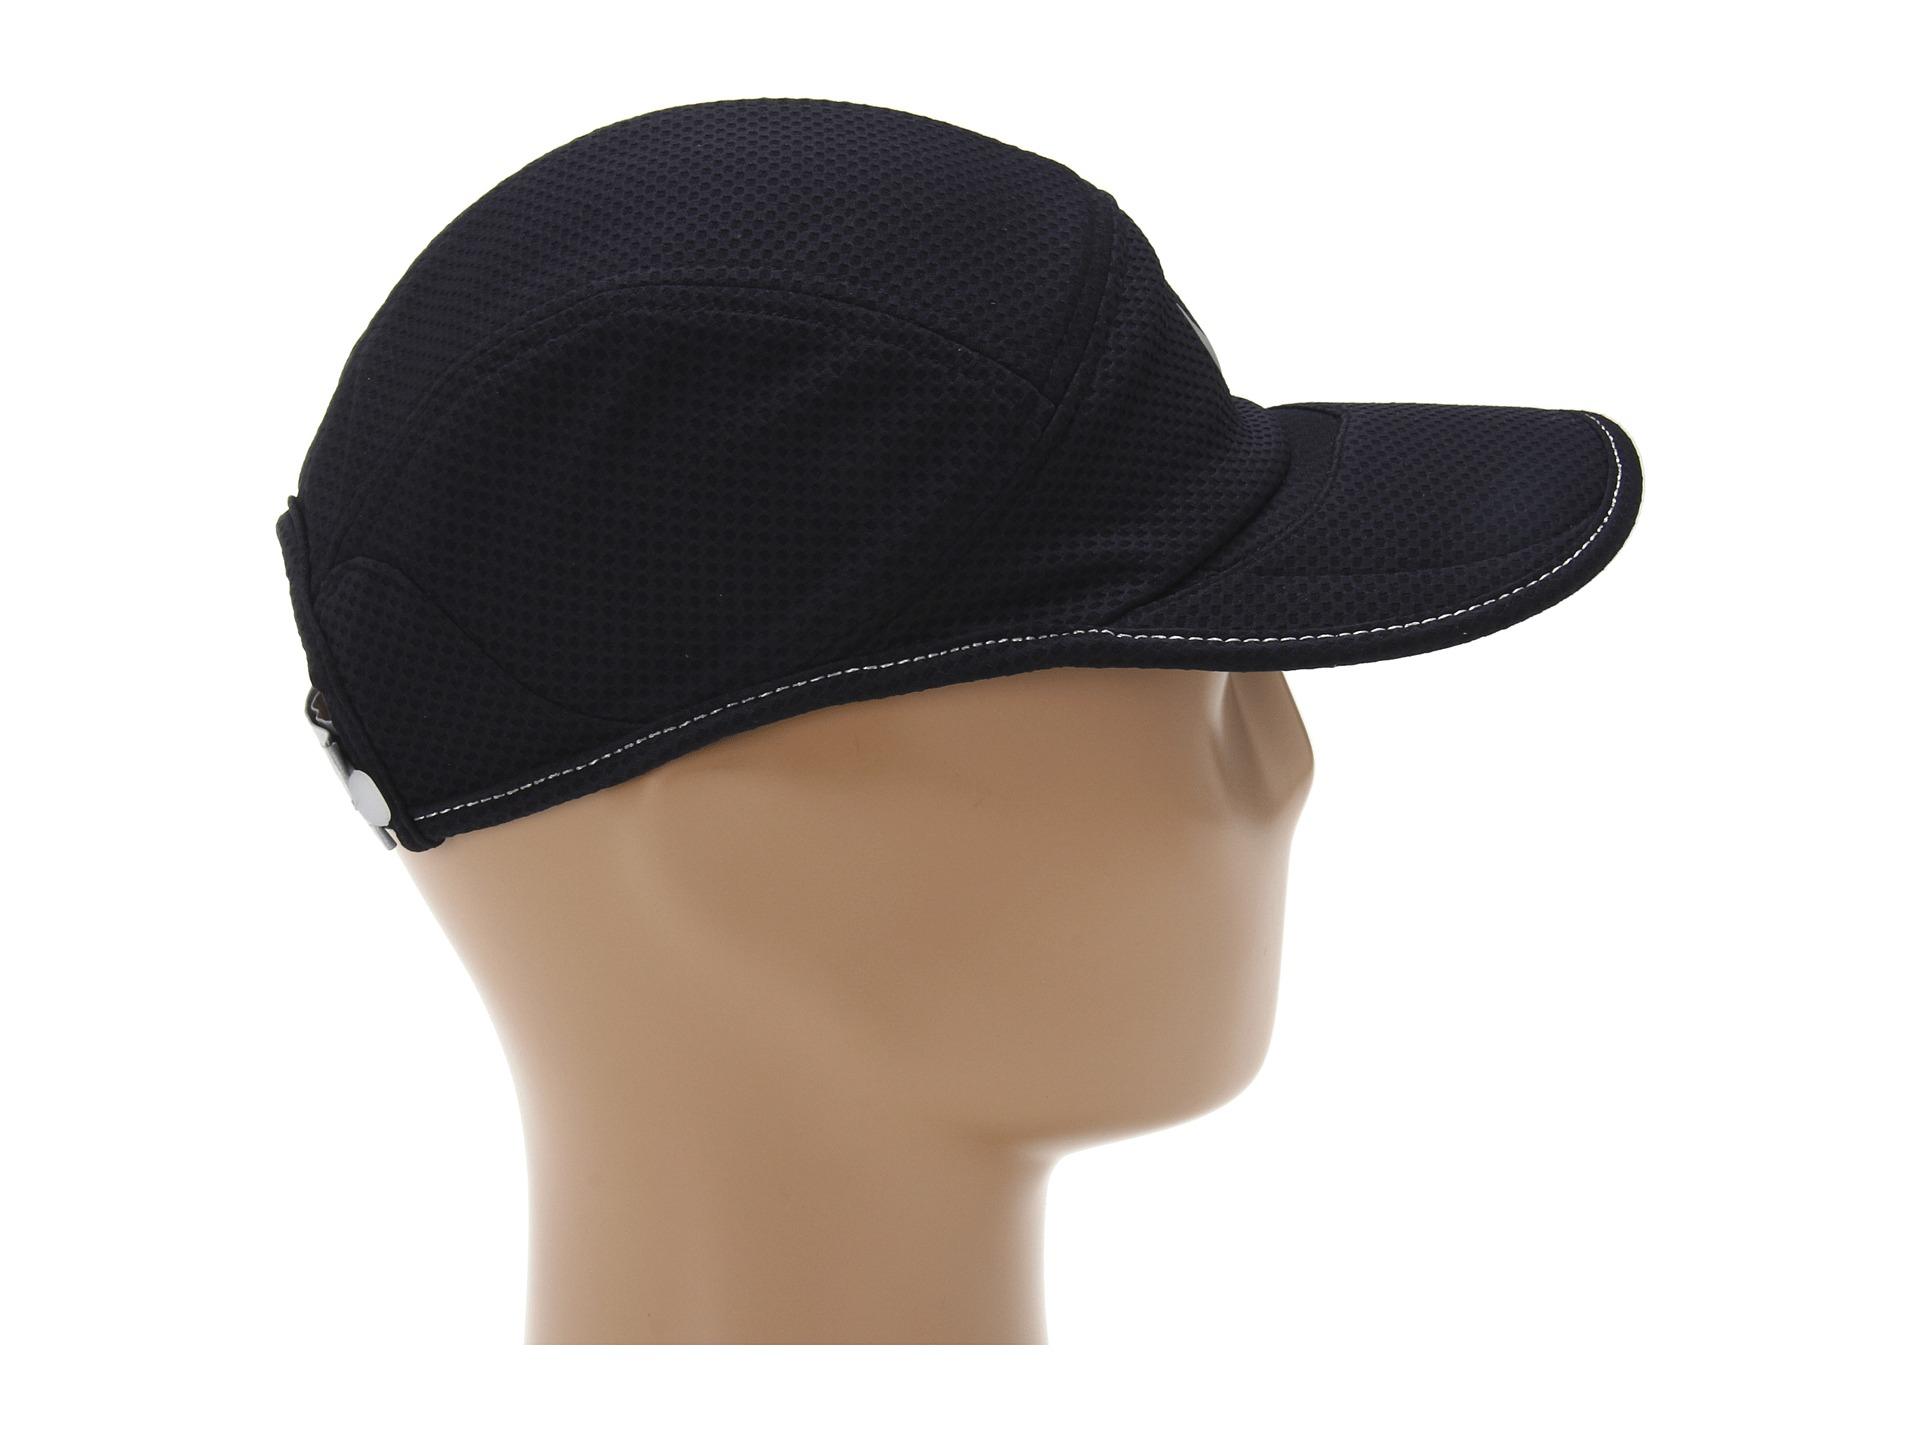 Lyst - Nike Ru Tw Mesh Daybreak Cap in Black 471704666e1